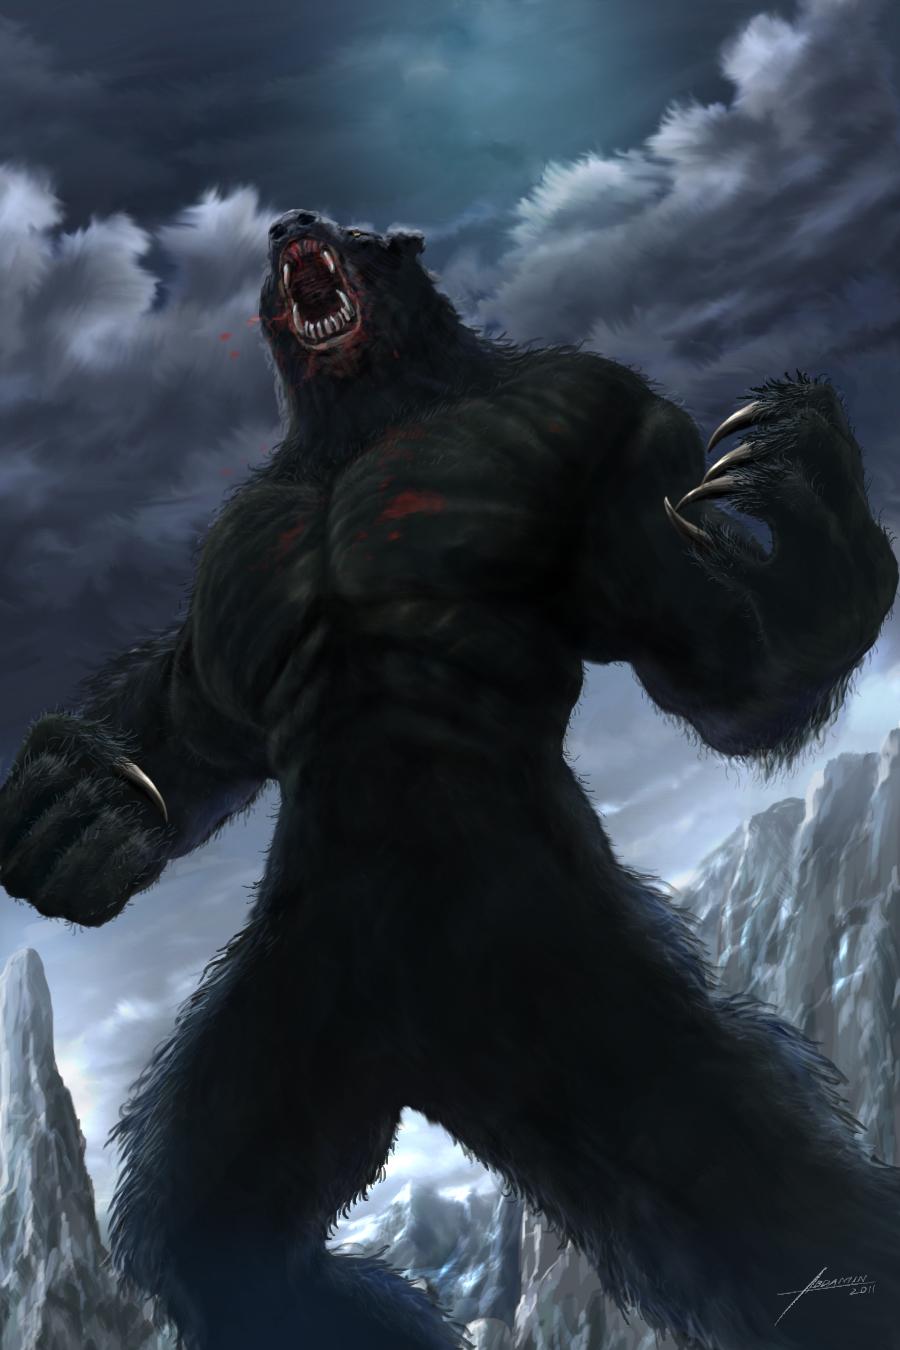 Náhkôhá'e Bear_monster_(werebear)